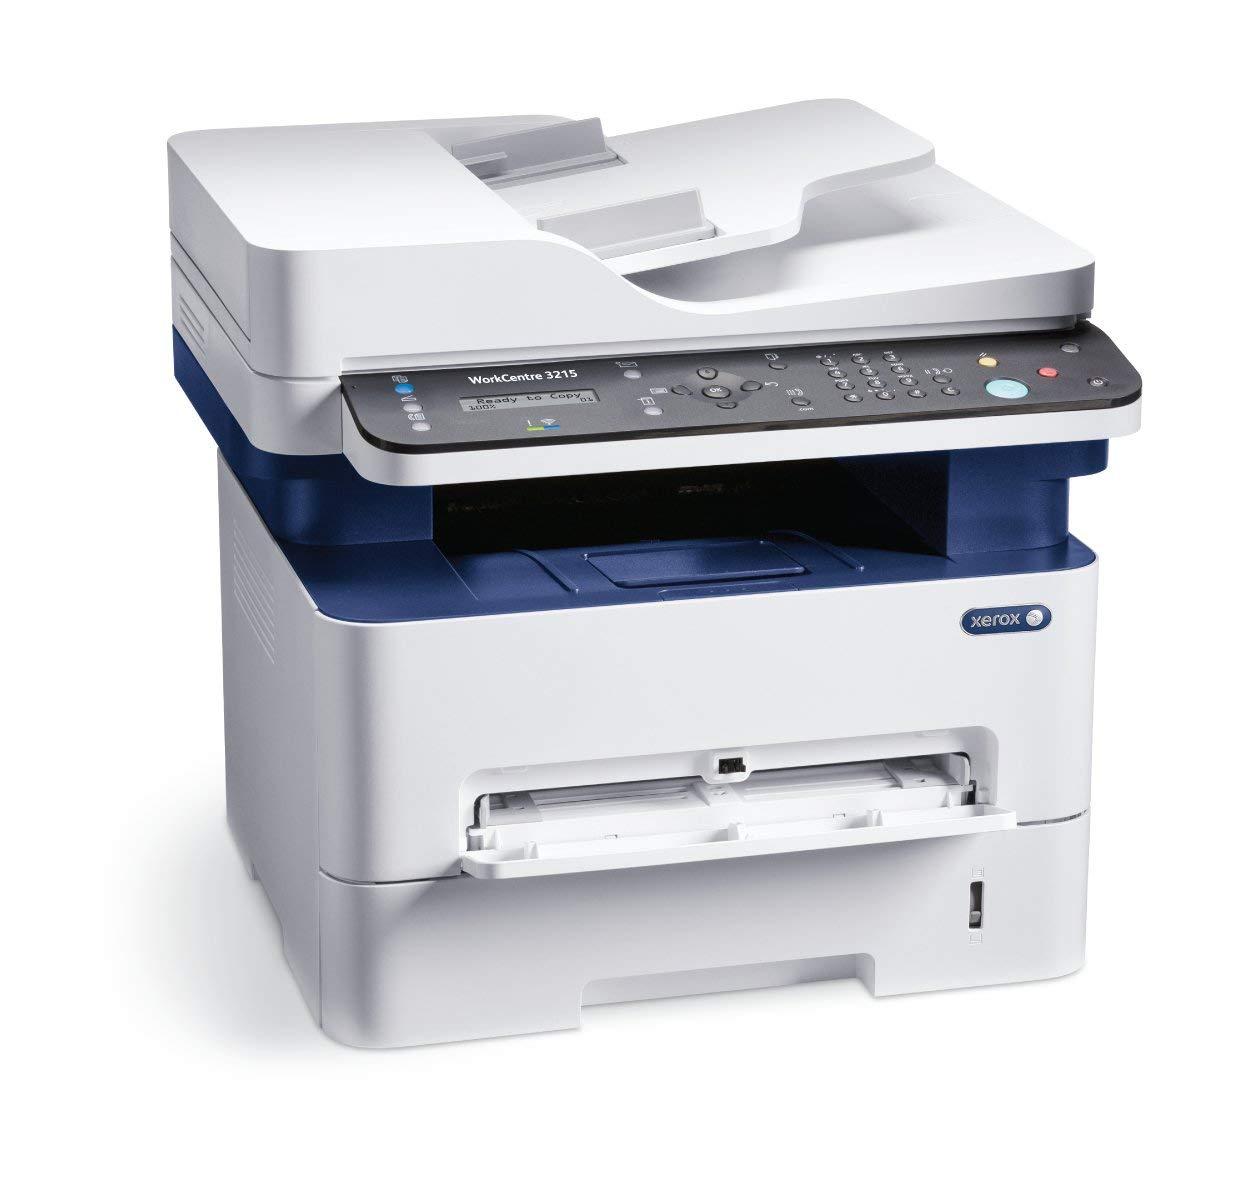 Xerox WorkCentre 3215/NI Monochrome Multifunction Printer (Renewed) by Xerox (Image #2)